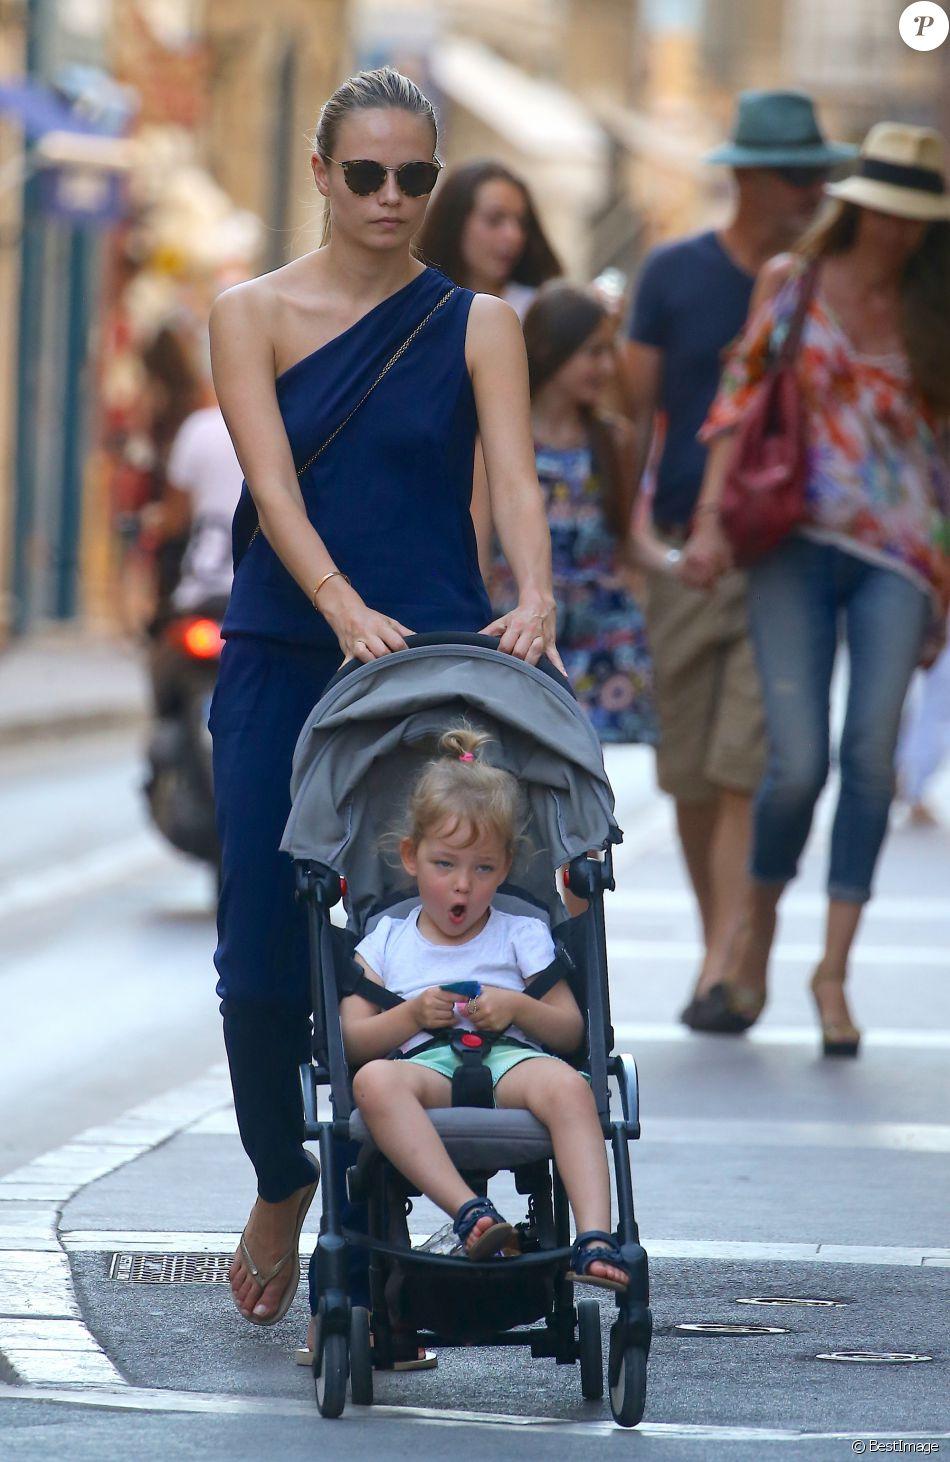 La mannequin russe Natasha Poly (Natalya Sergeyevna Polevchtchikova) se promène avec sa fille, Aleksandra Christina Bakker, dans les rues de Saint-Tropez, France, le 26 juillet 2016. © Agence/Bestimage